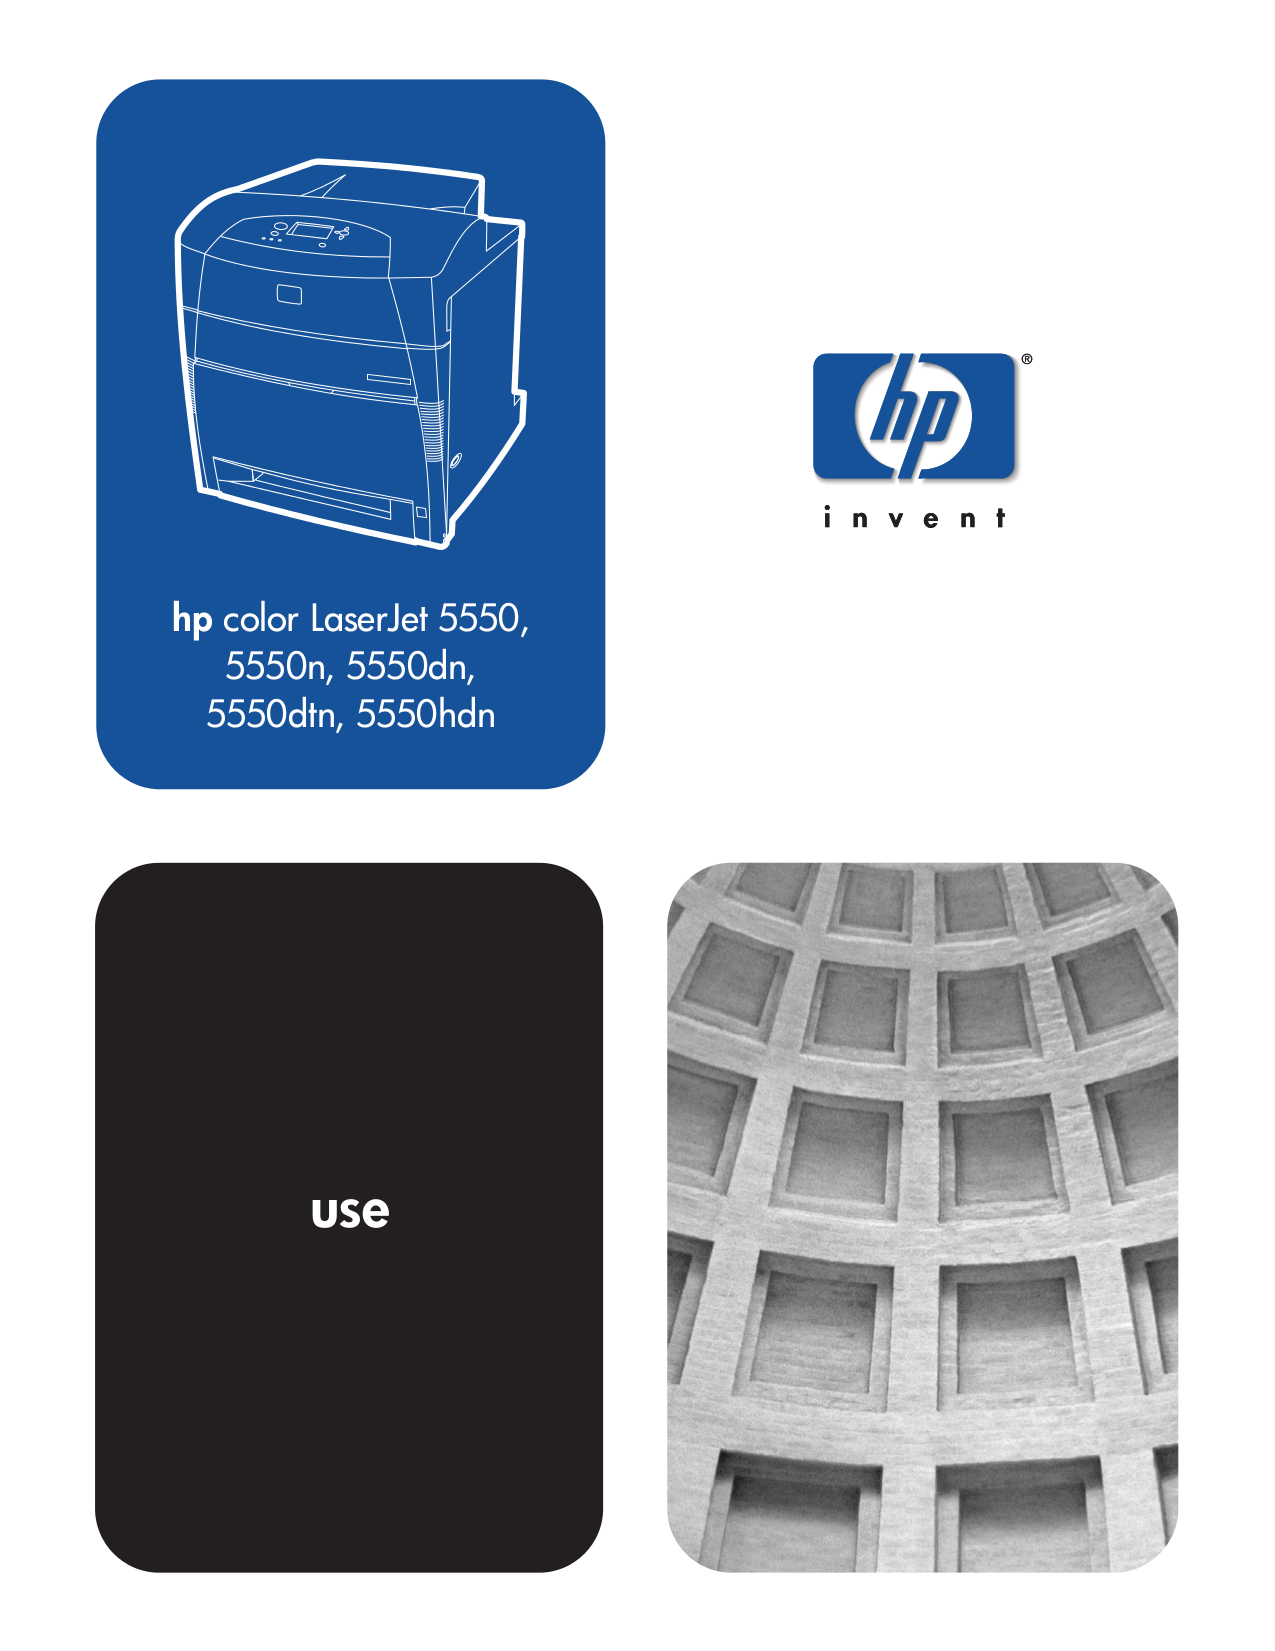 download free pdf for hp deskjet 5550 printer manual rh umlib com hp deskjet 5550 manual download hp deskjet 5550 troubleshooting blinking lights